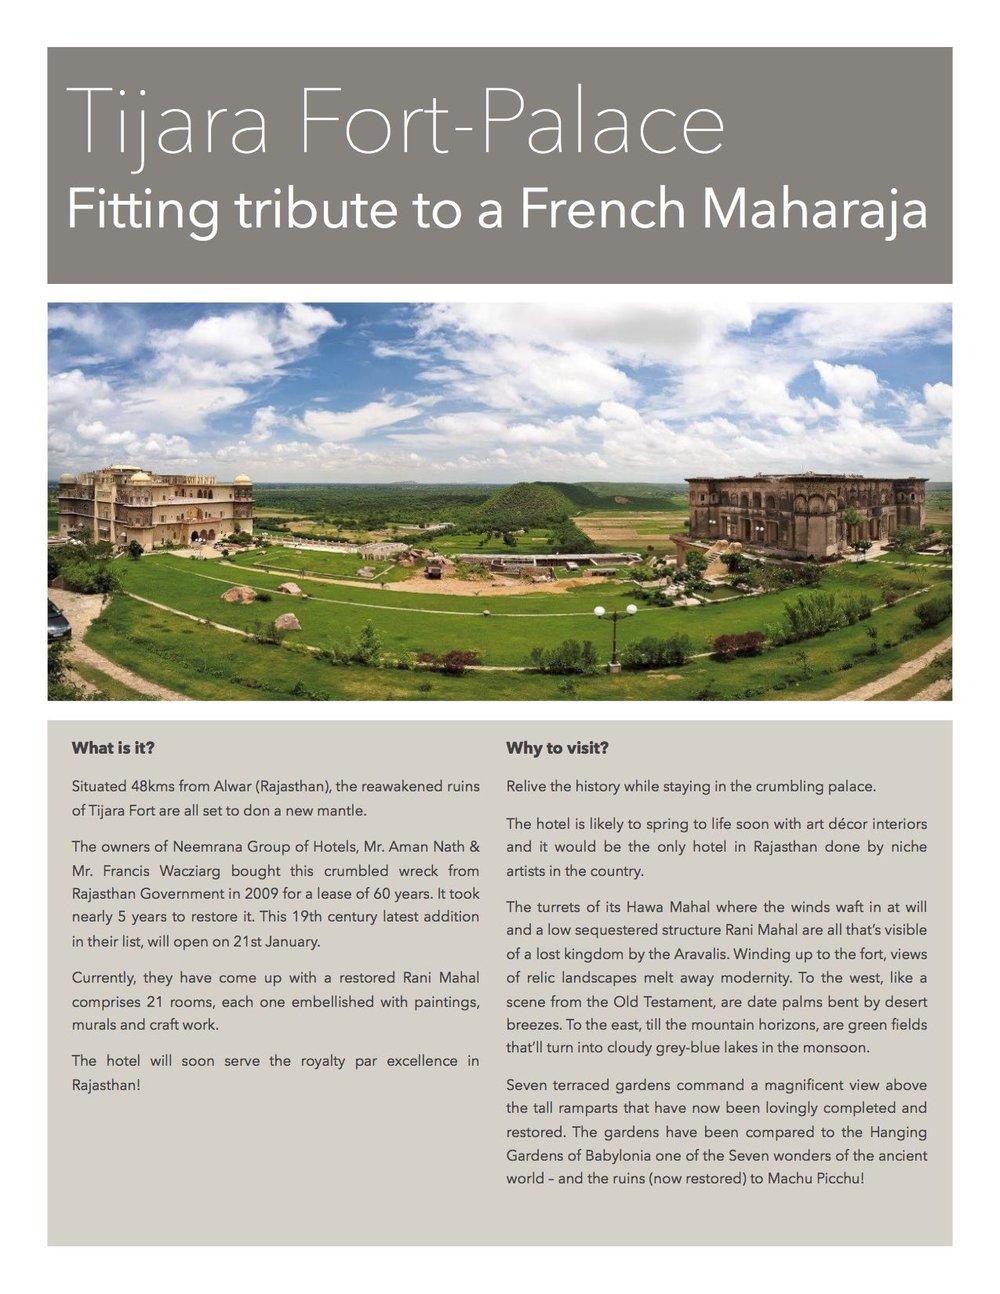 Tijara Fort-Palace - Your stay in Tijara, Rajasthan